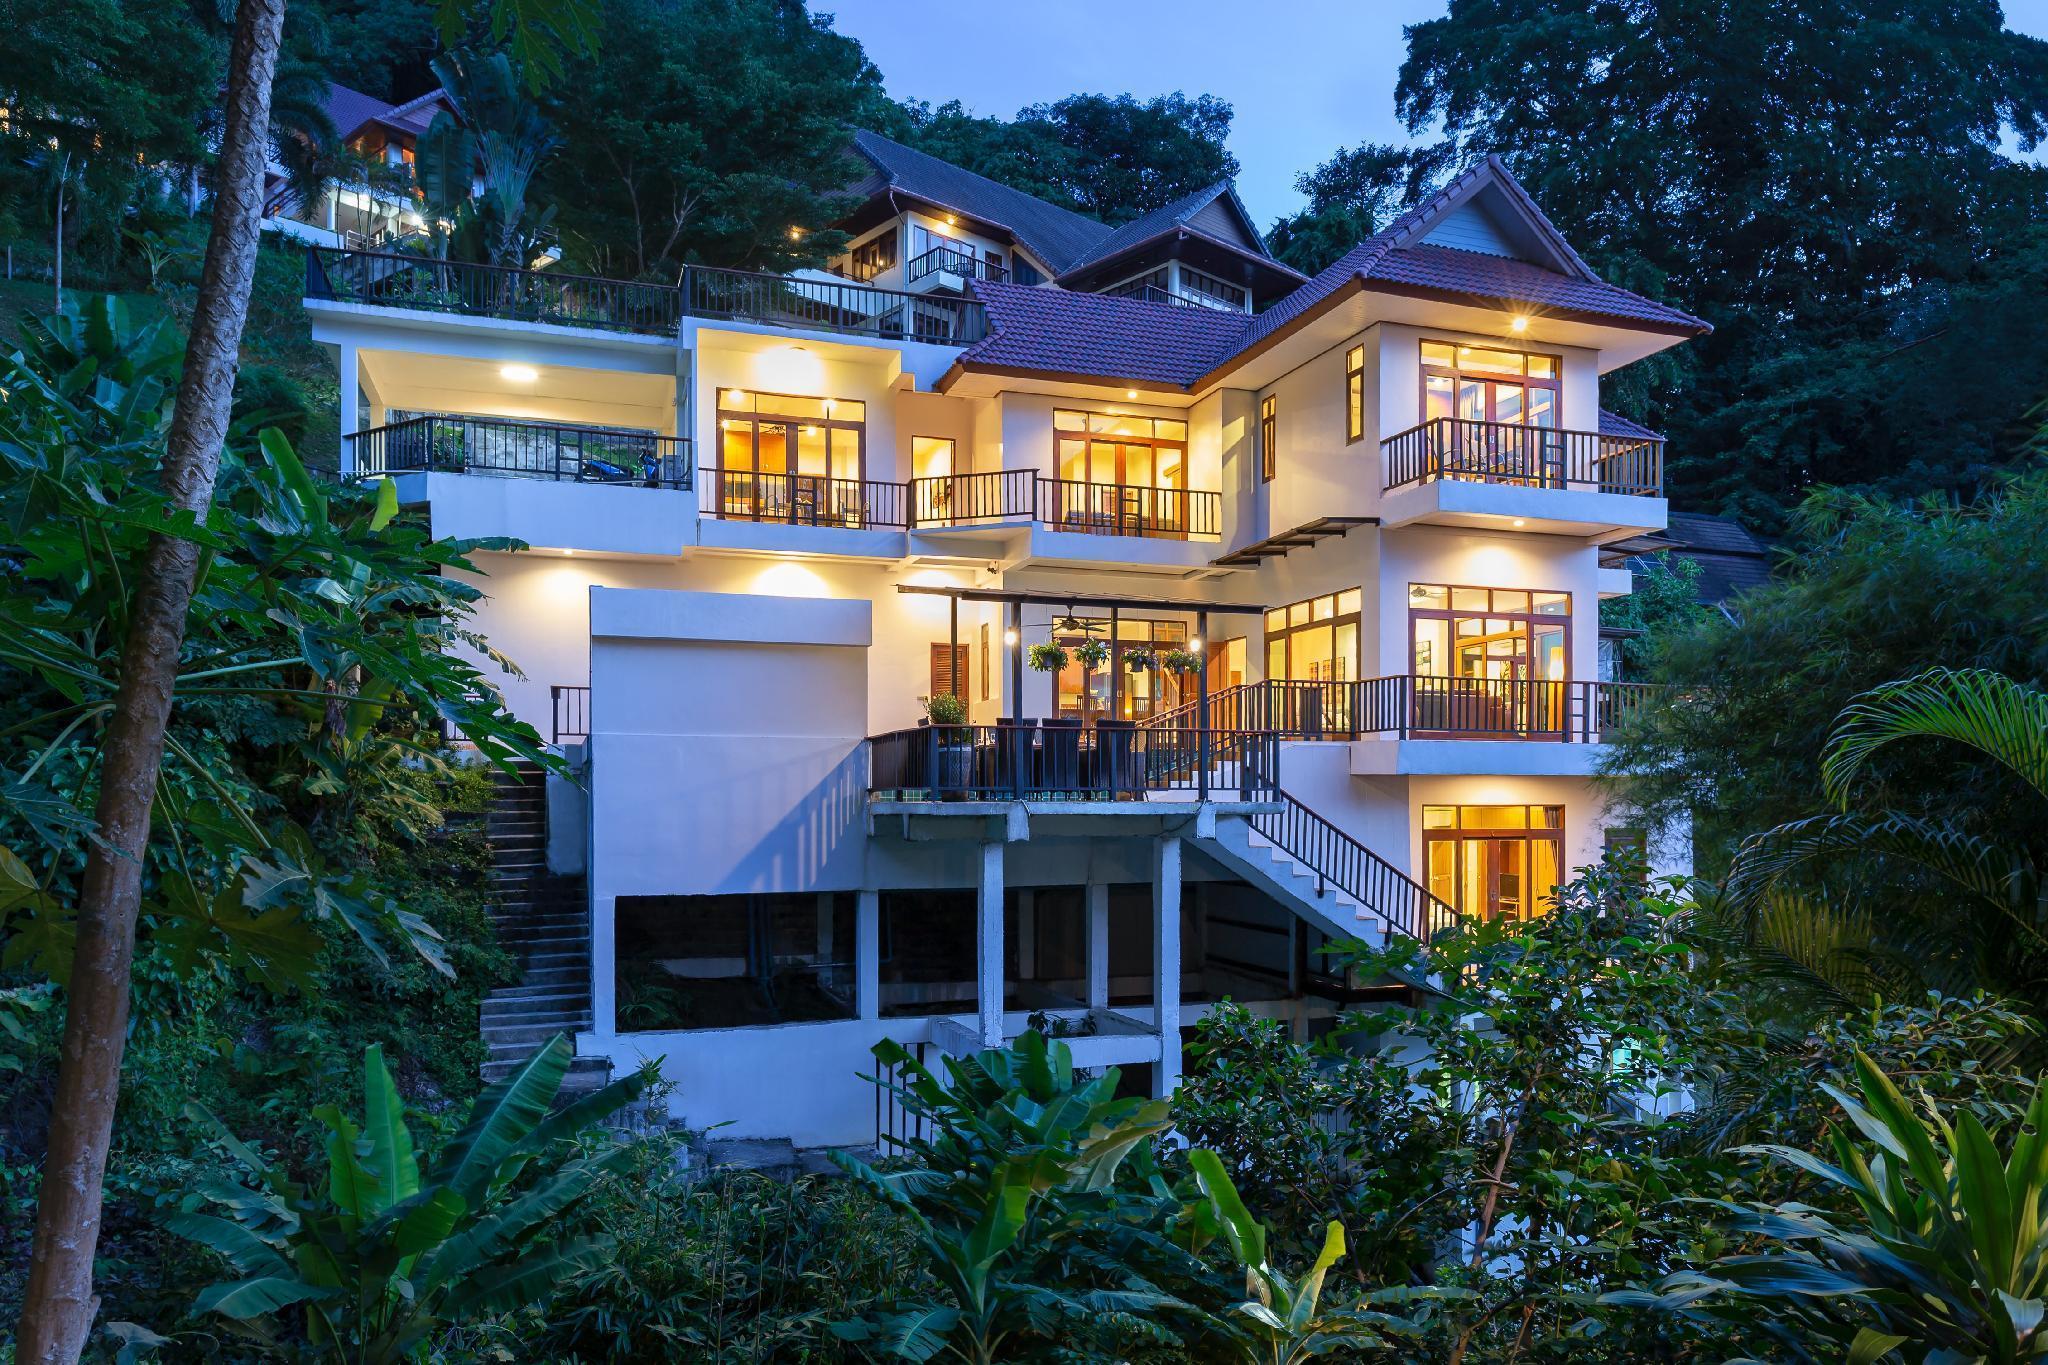 SEAVIEW Patong Pool Estate,  8 Bedrooms, Playroom วิลลา 8 ห้องนอน 8 ห้องน้ำส่วนตัว ขนาด 400 ตร.ม. – ป่าตอง